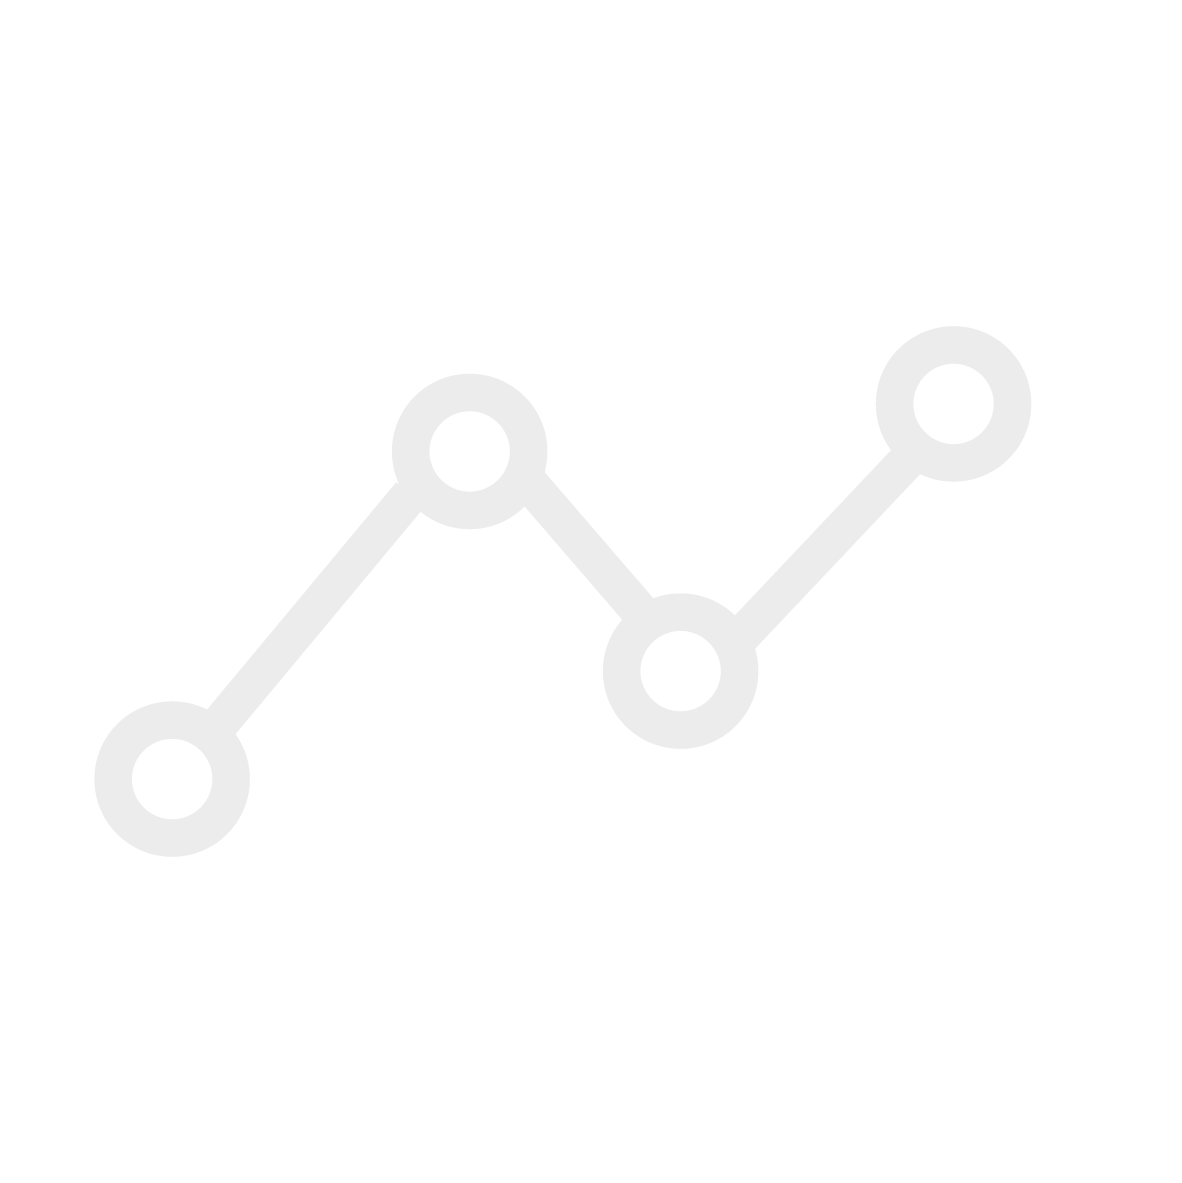 SwissPeaks_Icons Symboles_Grey_Graph.png